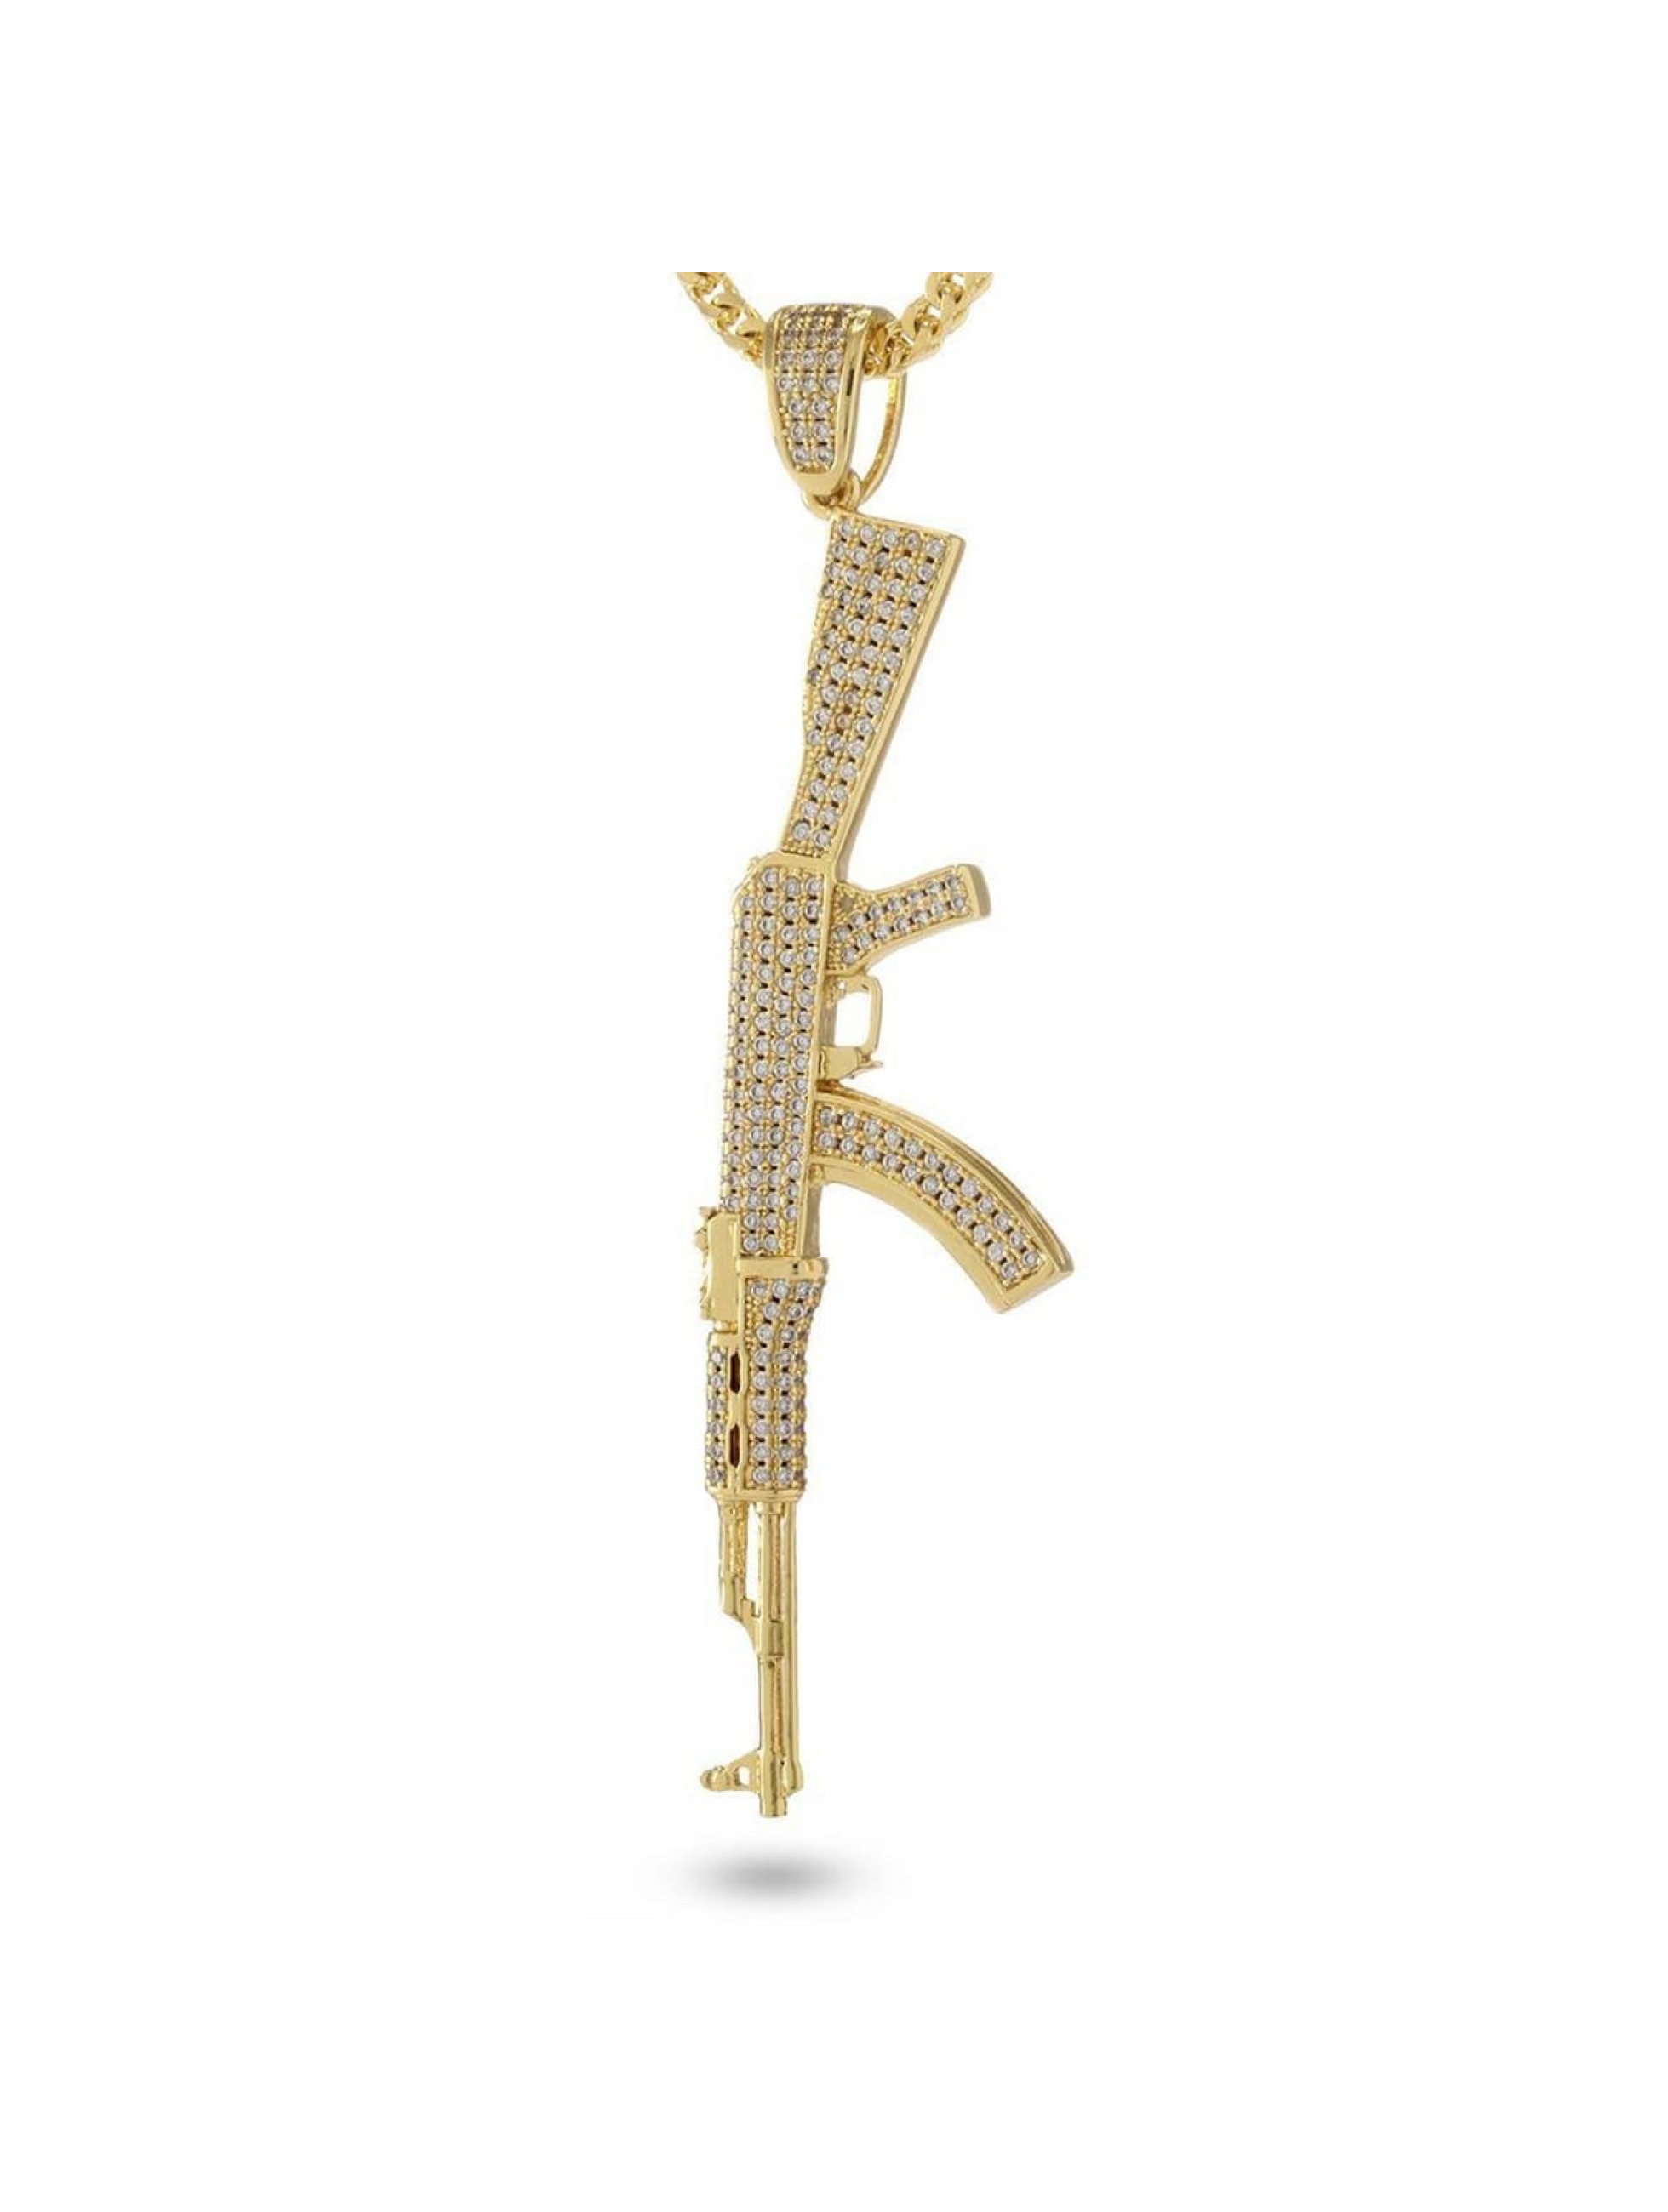 KING ICE Kette Studded AK-47 goldfarben